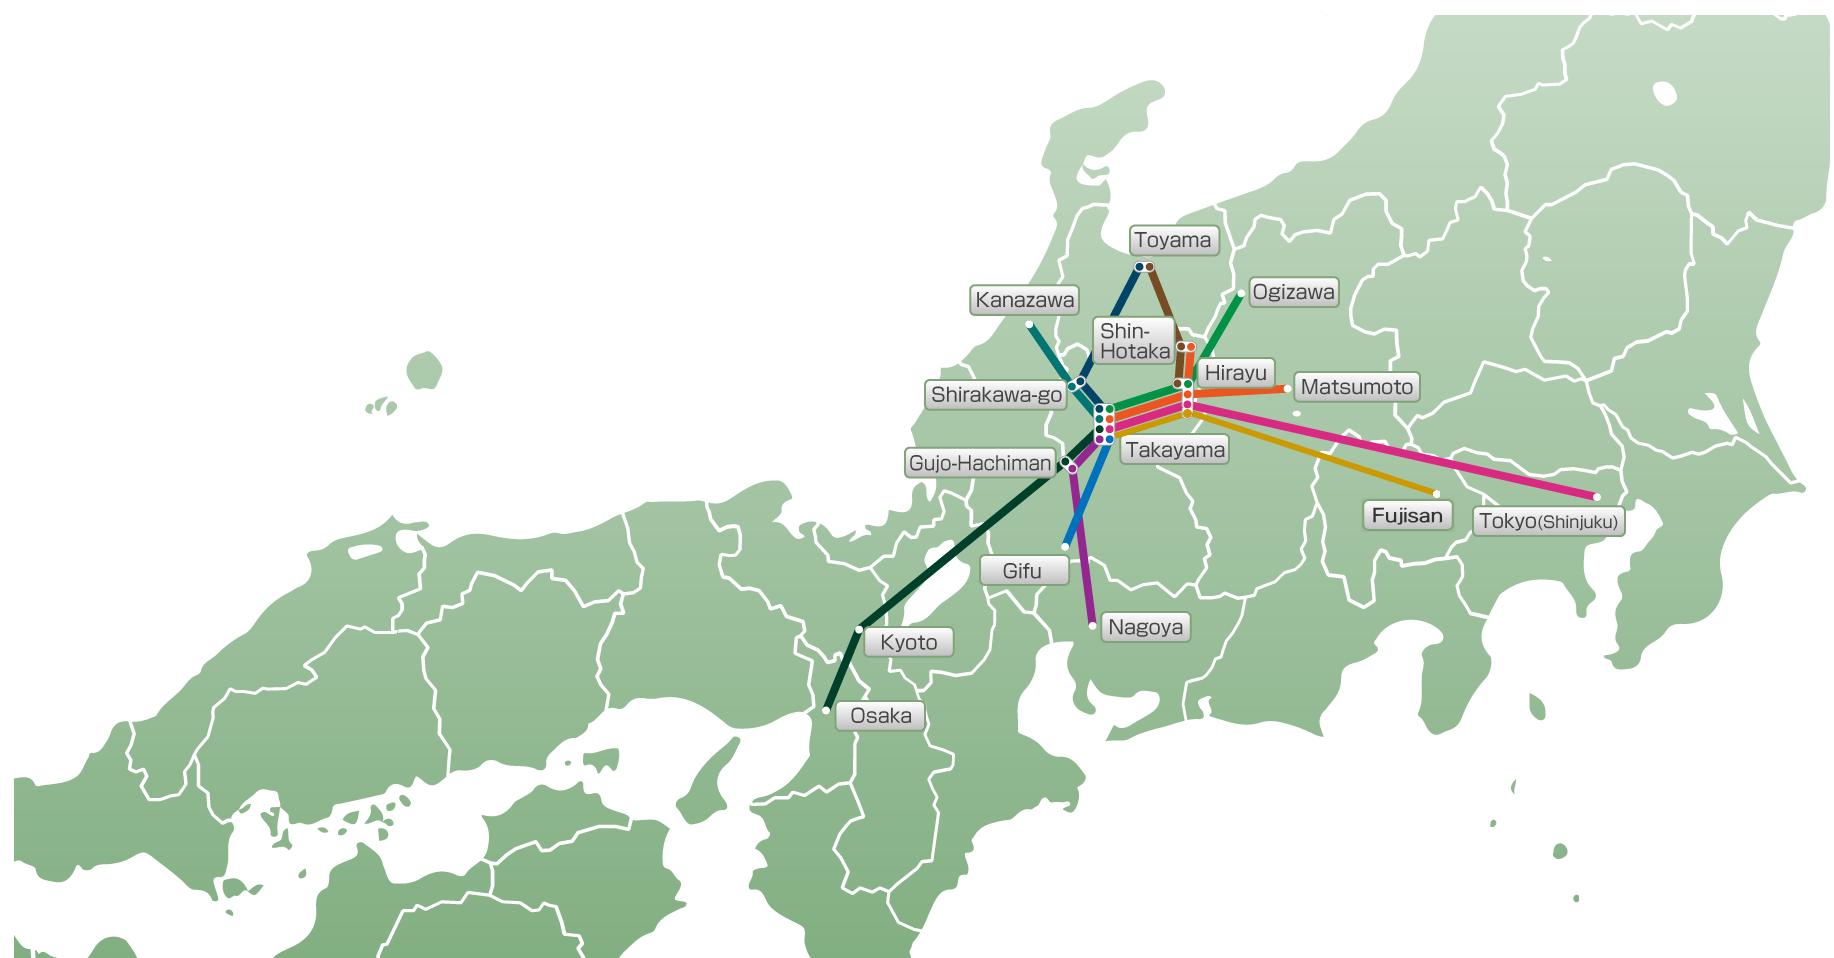 Nouhi Bus 濃飛バス公式サイト - Japan map kanazawa